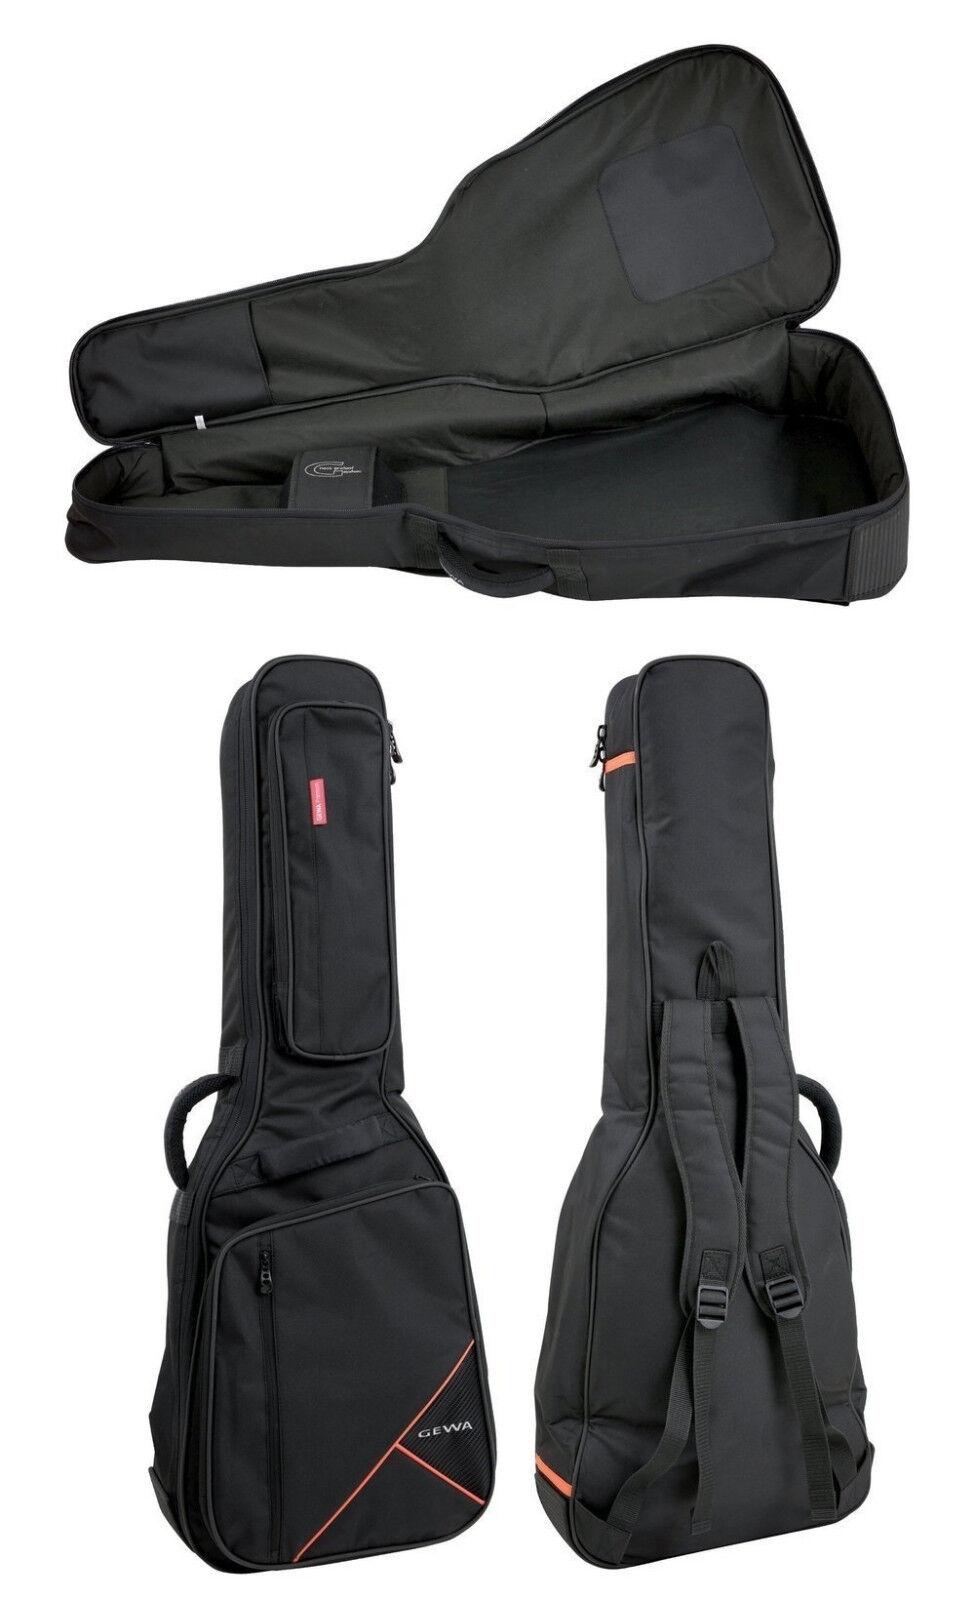 GEWA Gig Bag Premium 20 für E-Gitarre